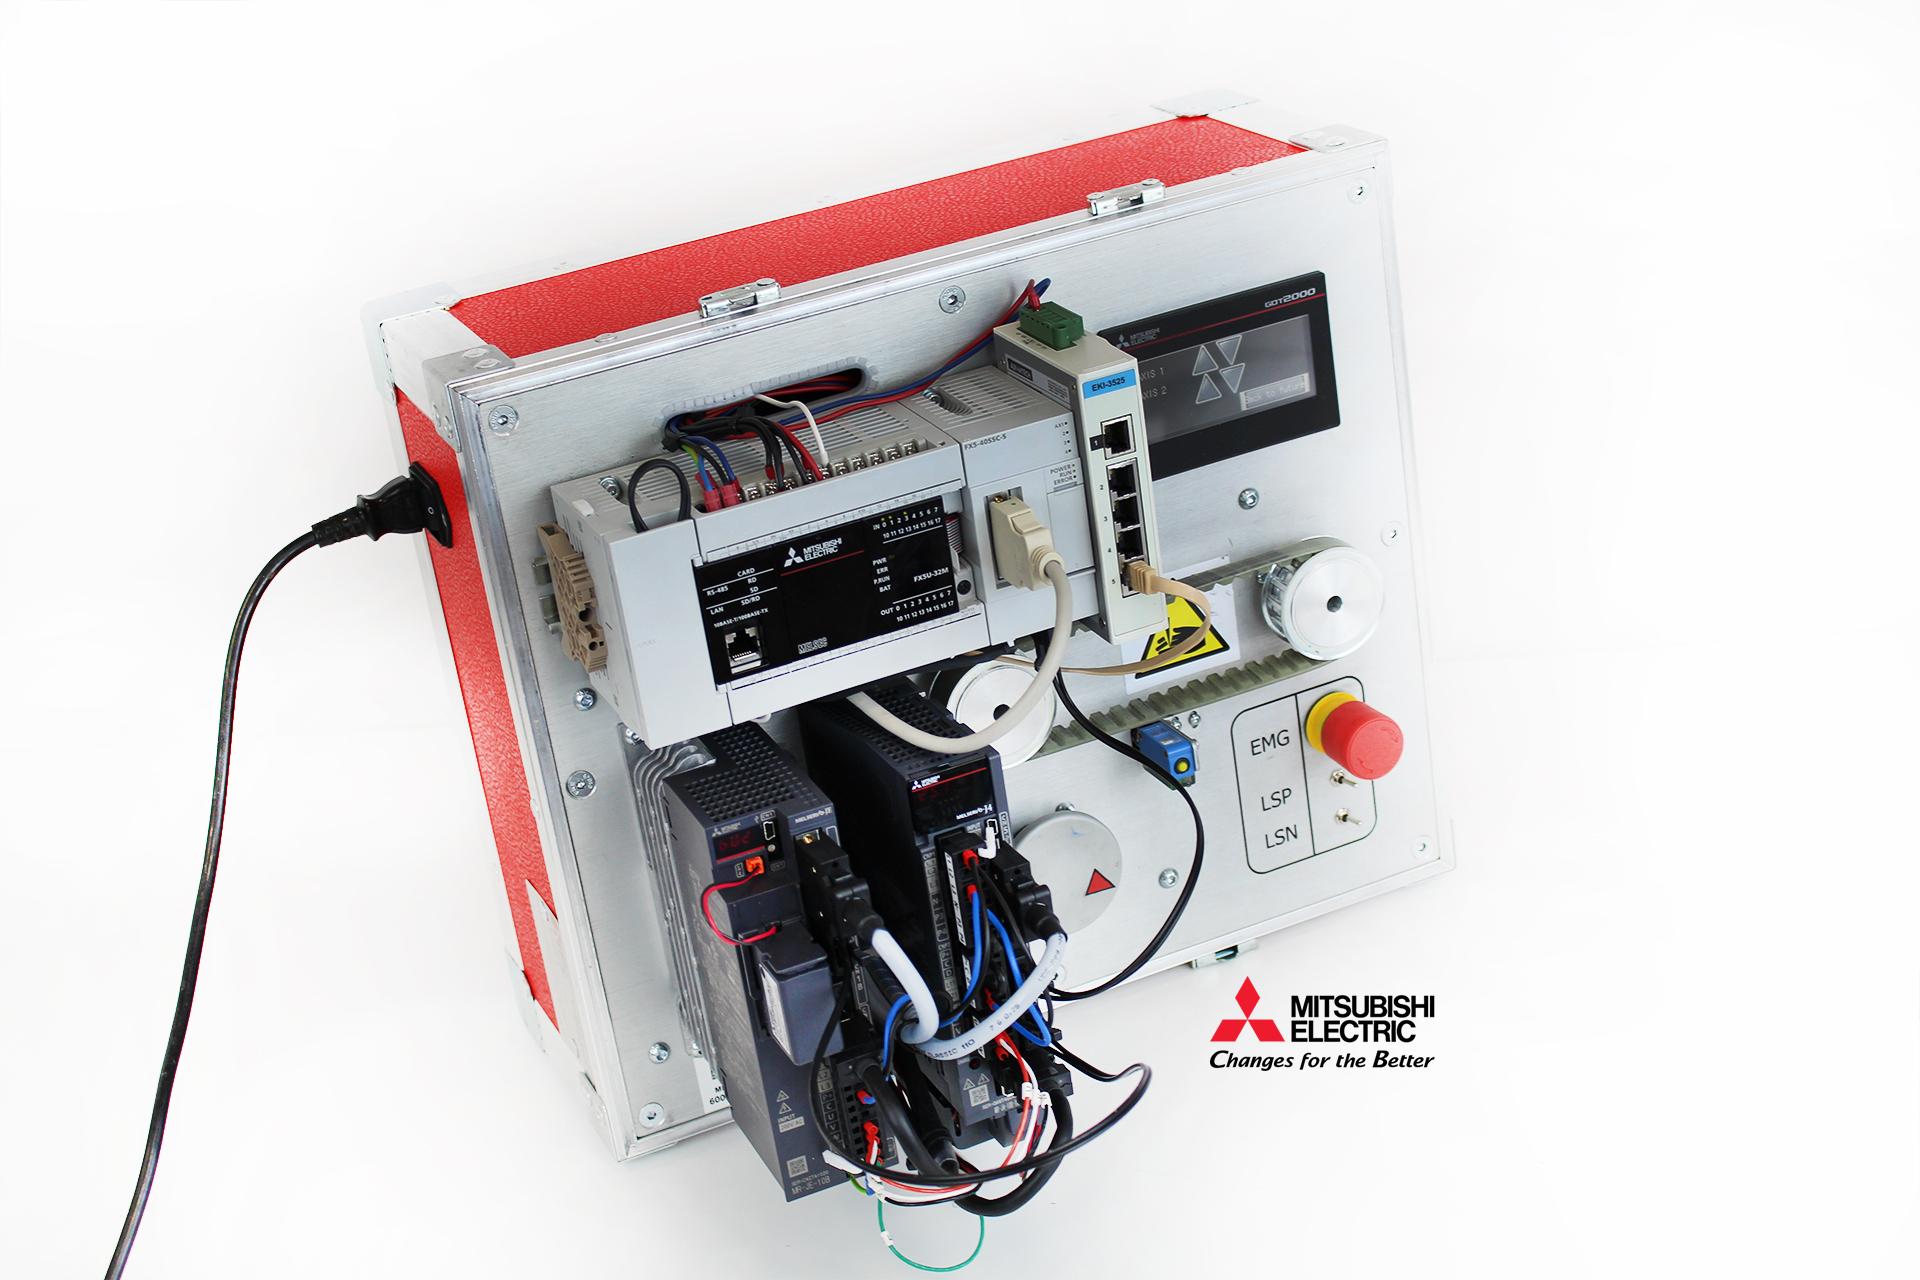 mitsubishi-electric-servo-iautomatyka-2